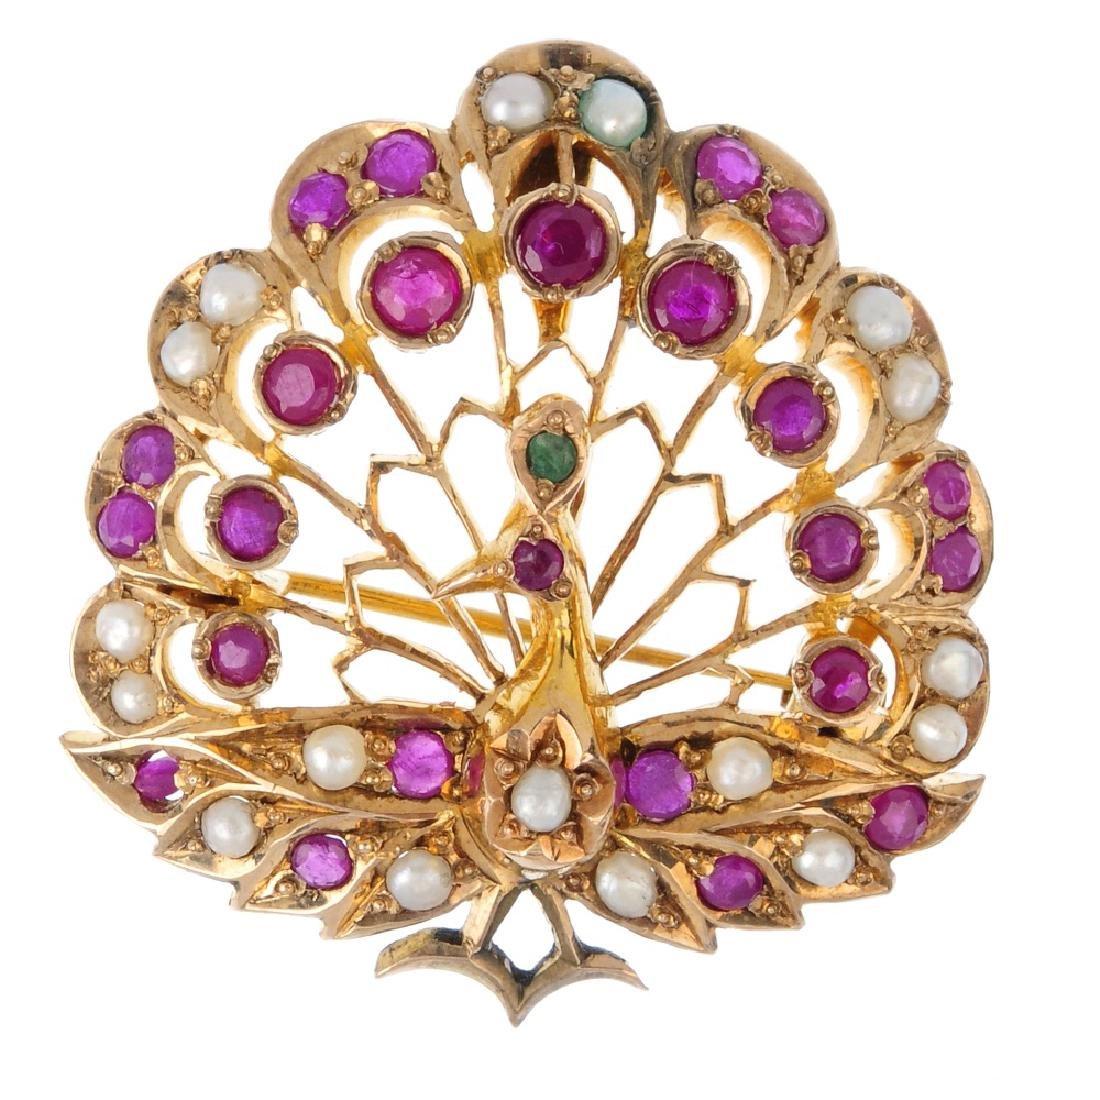 A gem-set peacock brooch. Of openwork design, the split